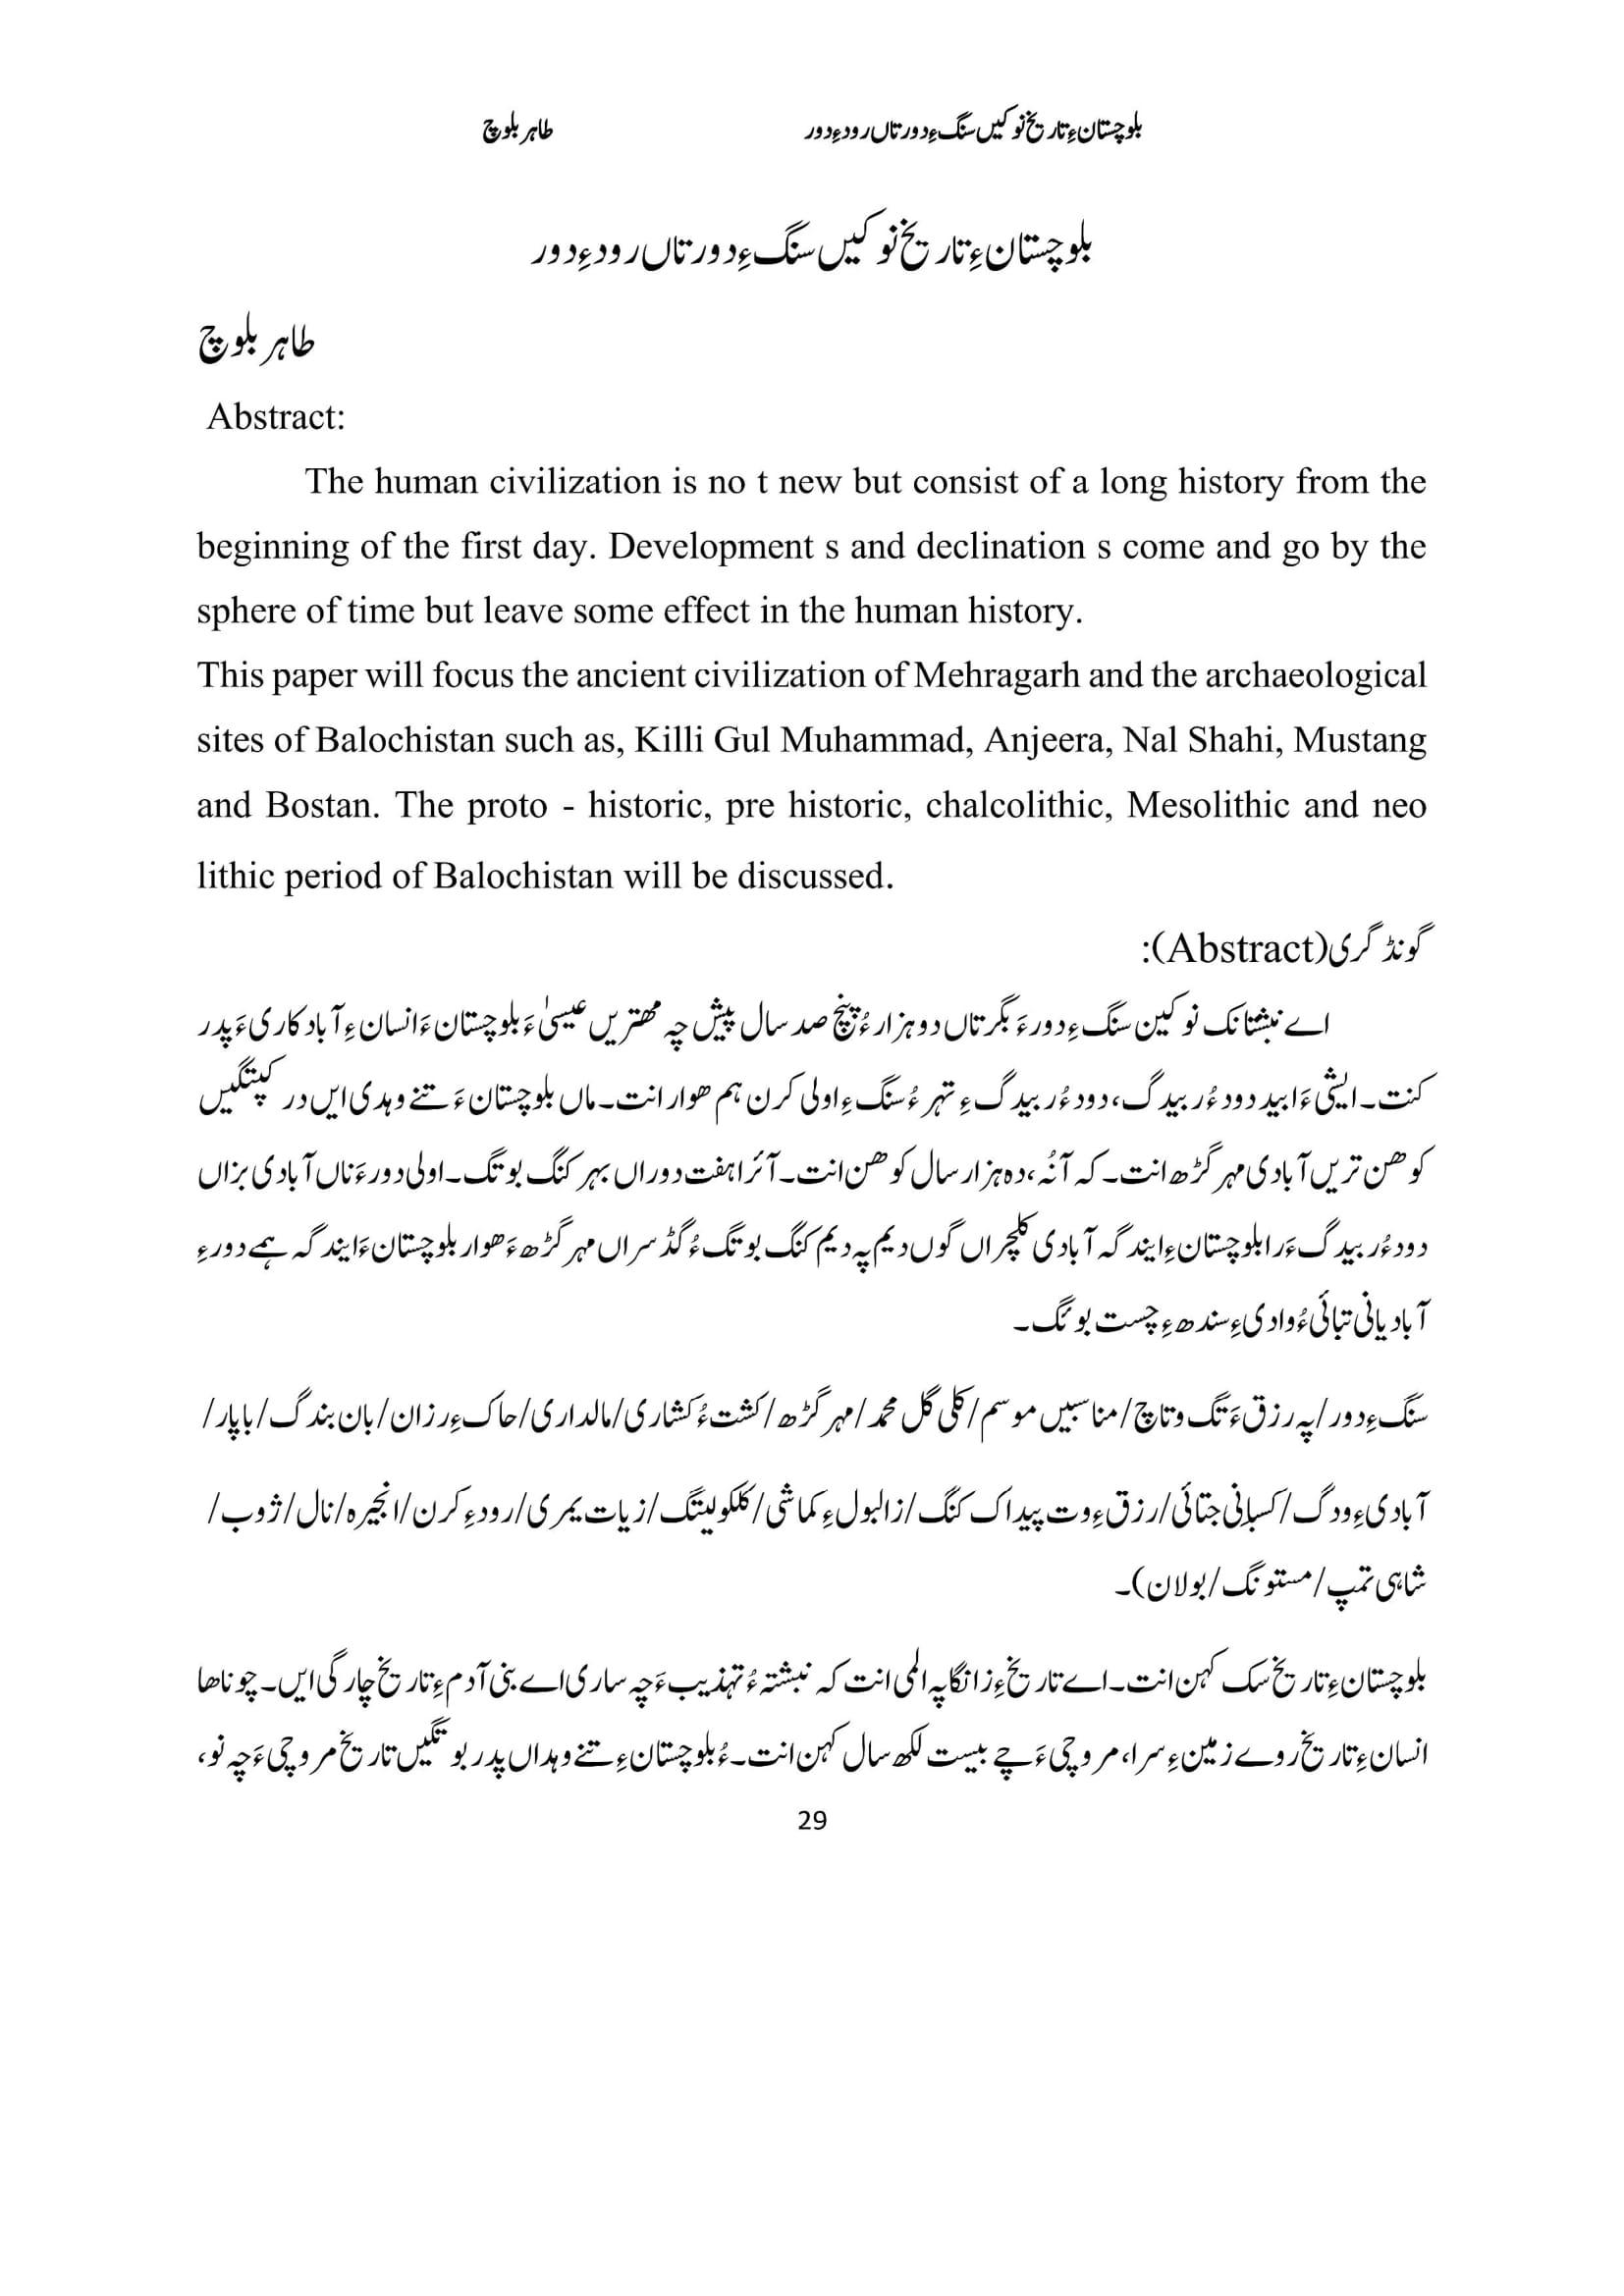 بلوچستان ءِ تاریخ نوکیں سنگ ءِ دورتاں  رود ءِ دور